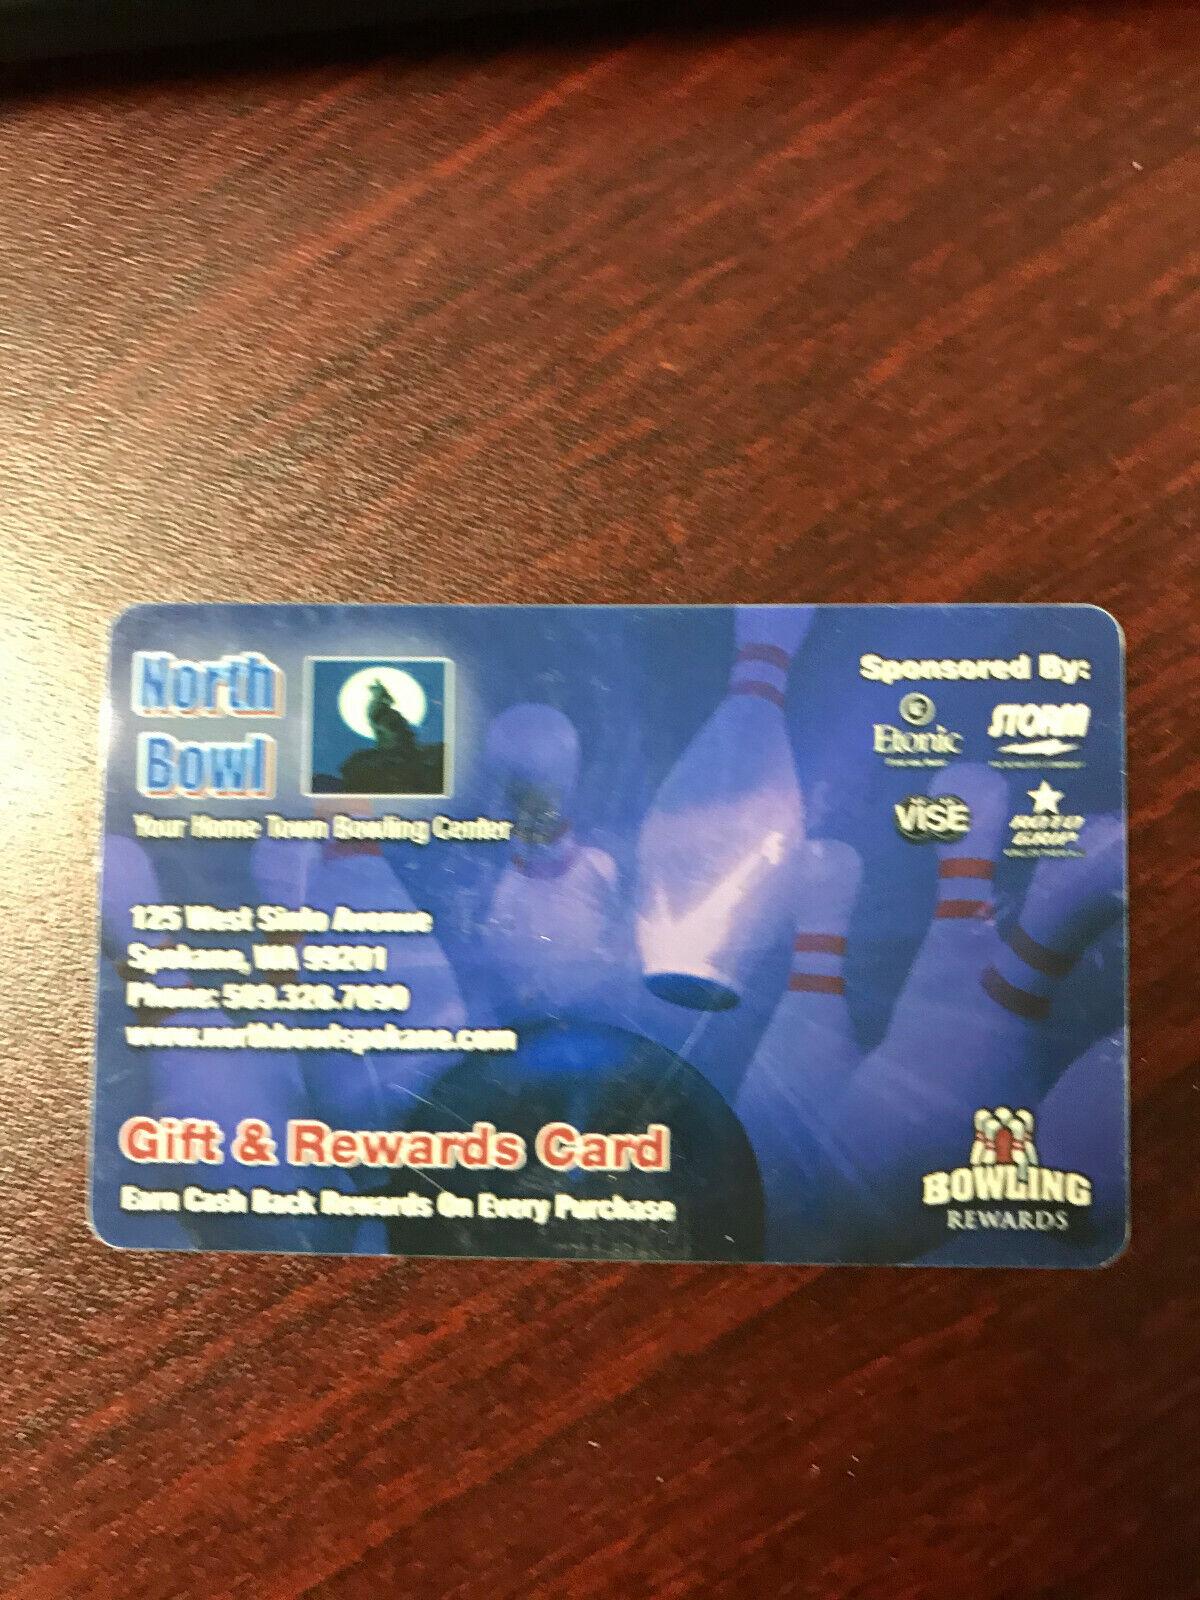 North Bowl -- Spokane, WA -- Gift Card 10 - $4.00